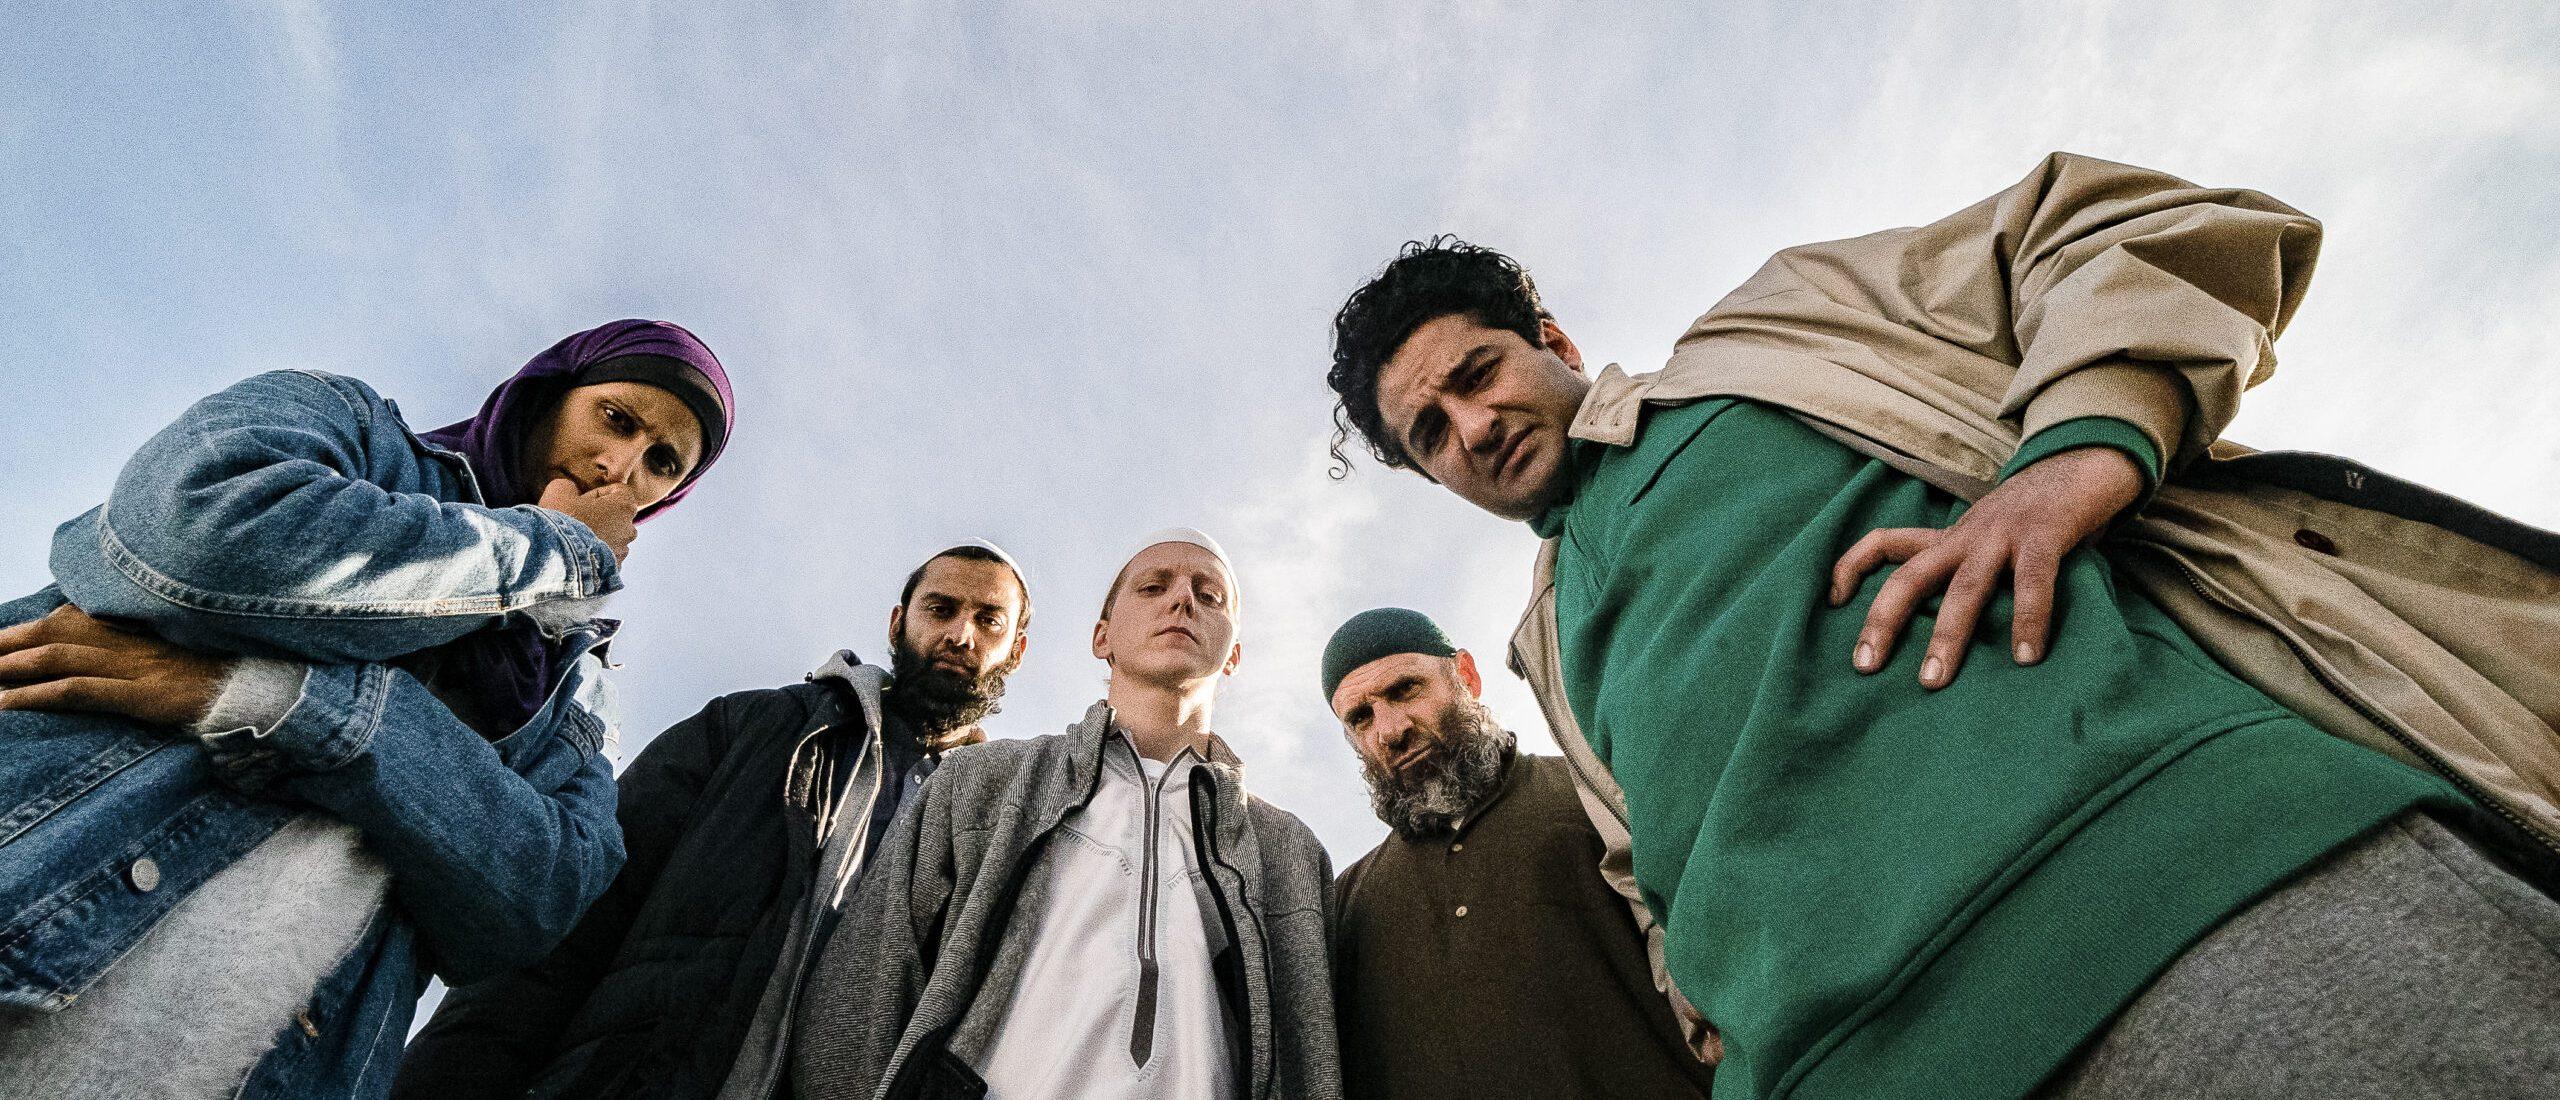 Hina Zaidi, Ayaz Hussain, Jonas Strand Gravli, Arben Bala og Nader Khademi. Foto: Dag Jensen/Rubicon/NRK